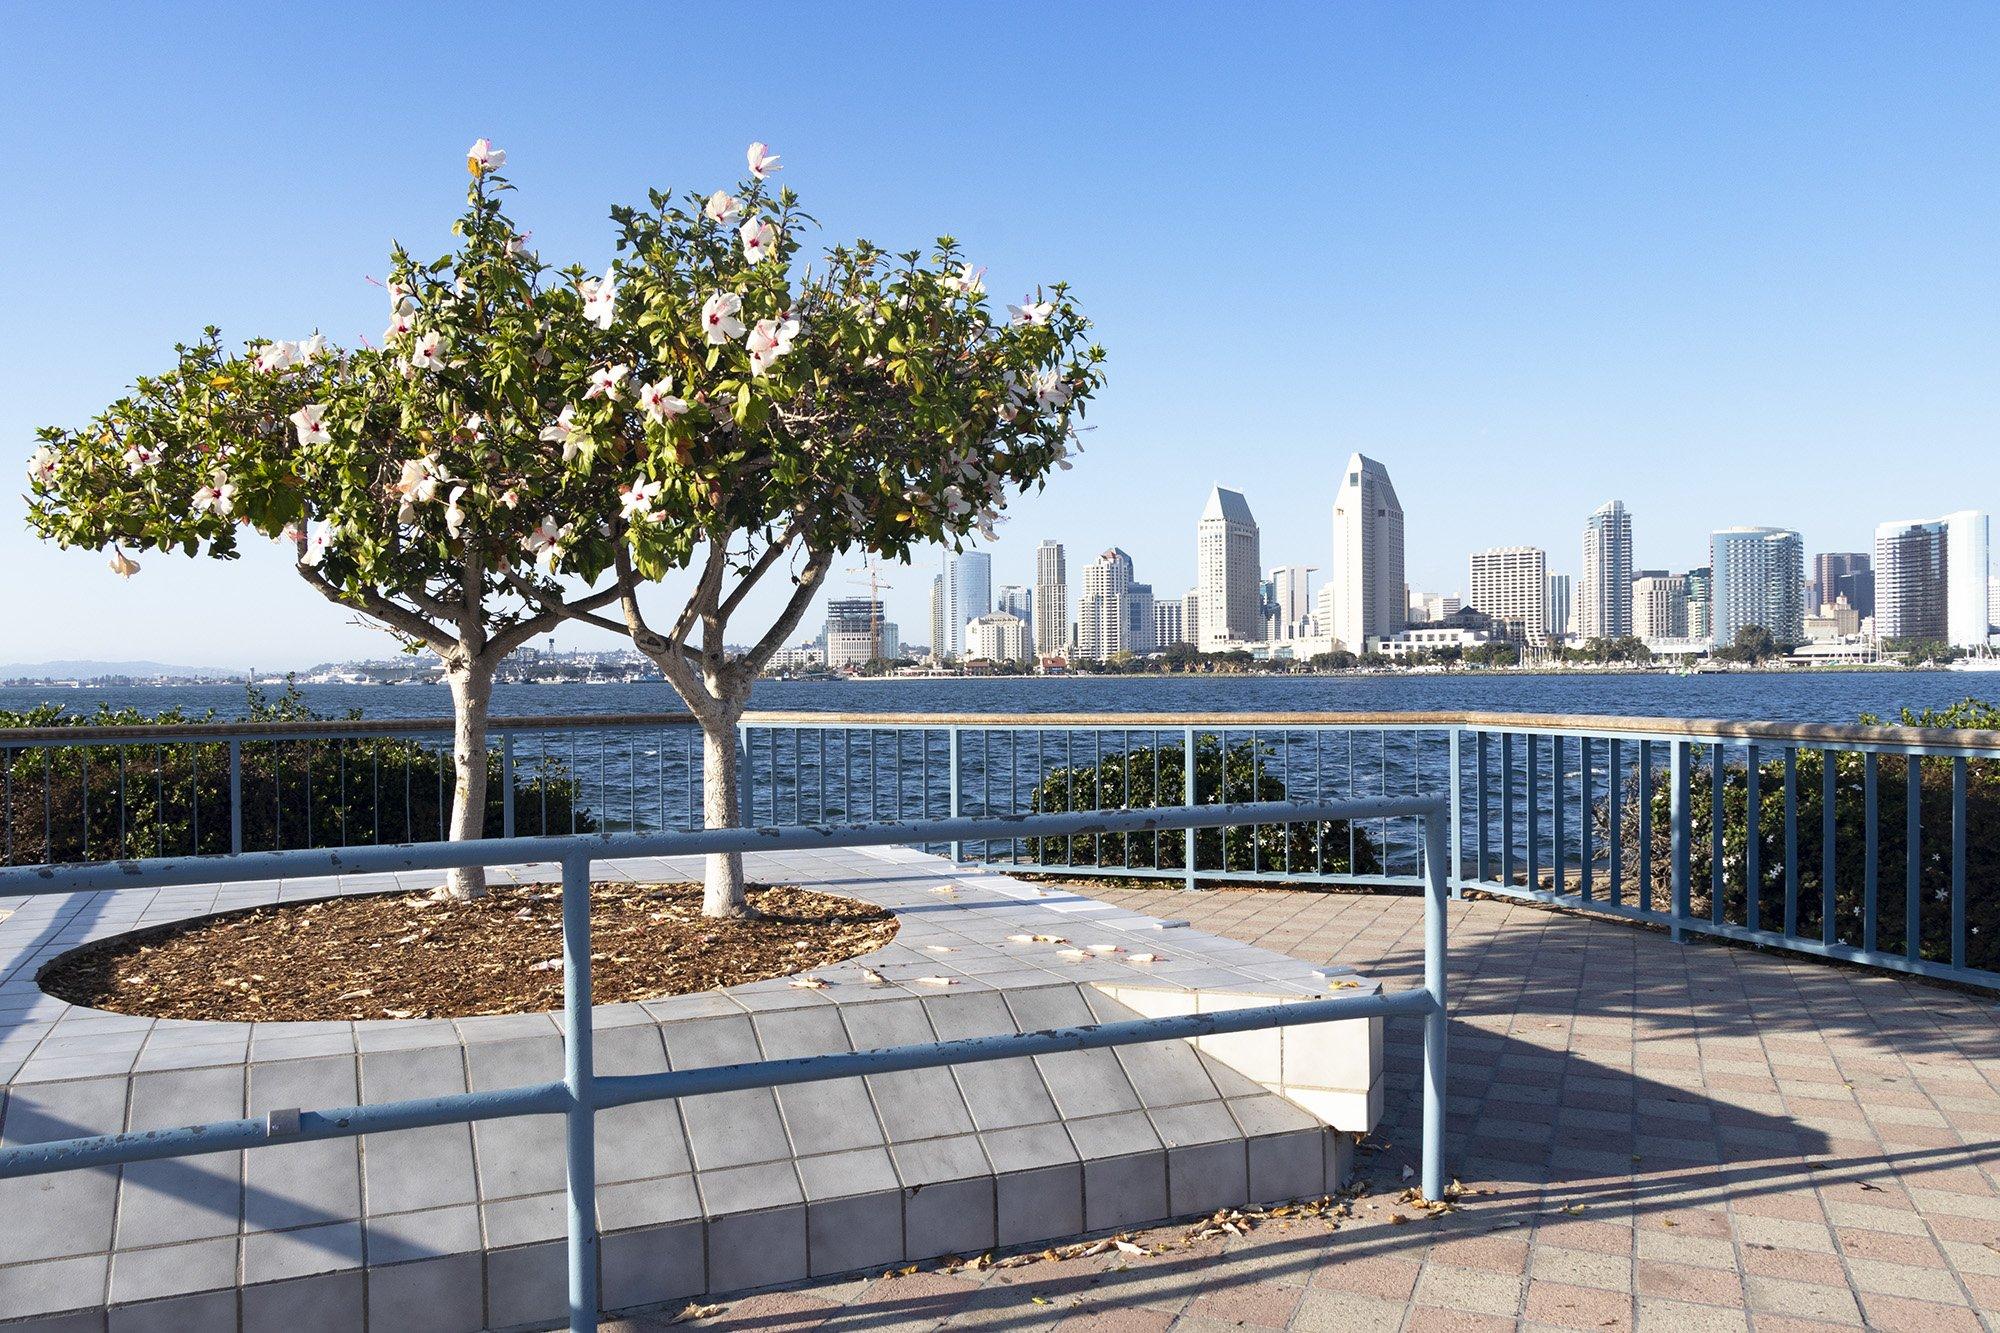 San Diego skyline viewpoint from Coronado Island